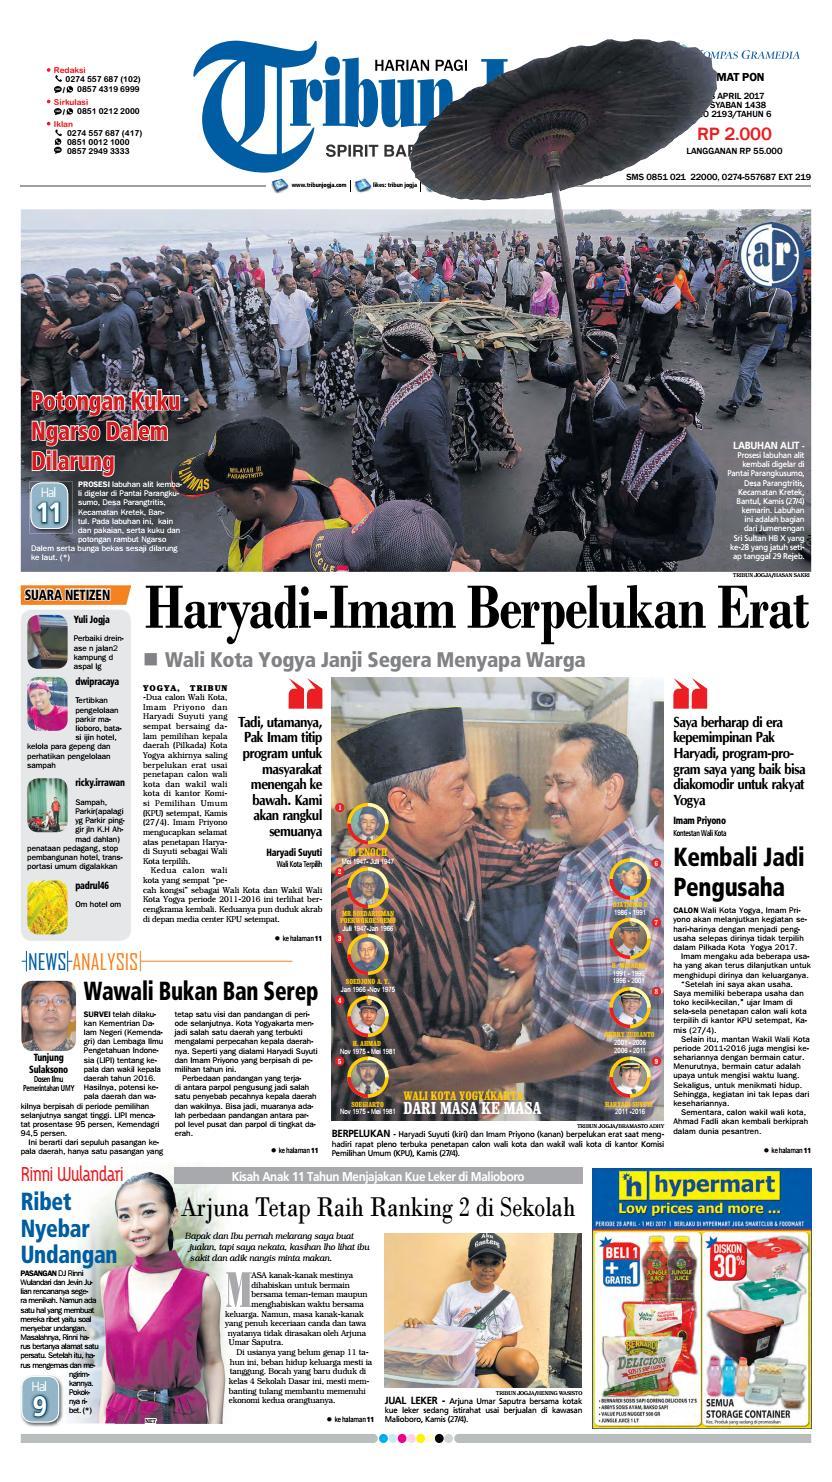 Tribunjogja 28 04 2017 By Tribun Jogja Issuu Produk Ukm Bumn Kain Batik Middle Premium 3 Bendera 01